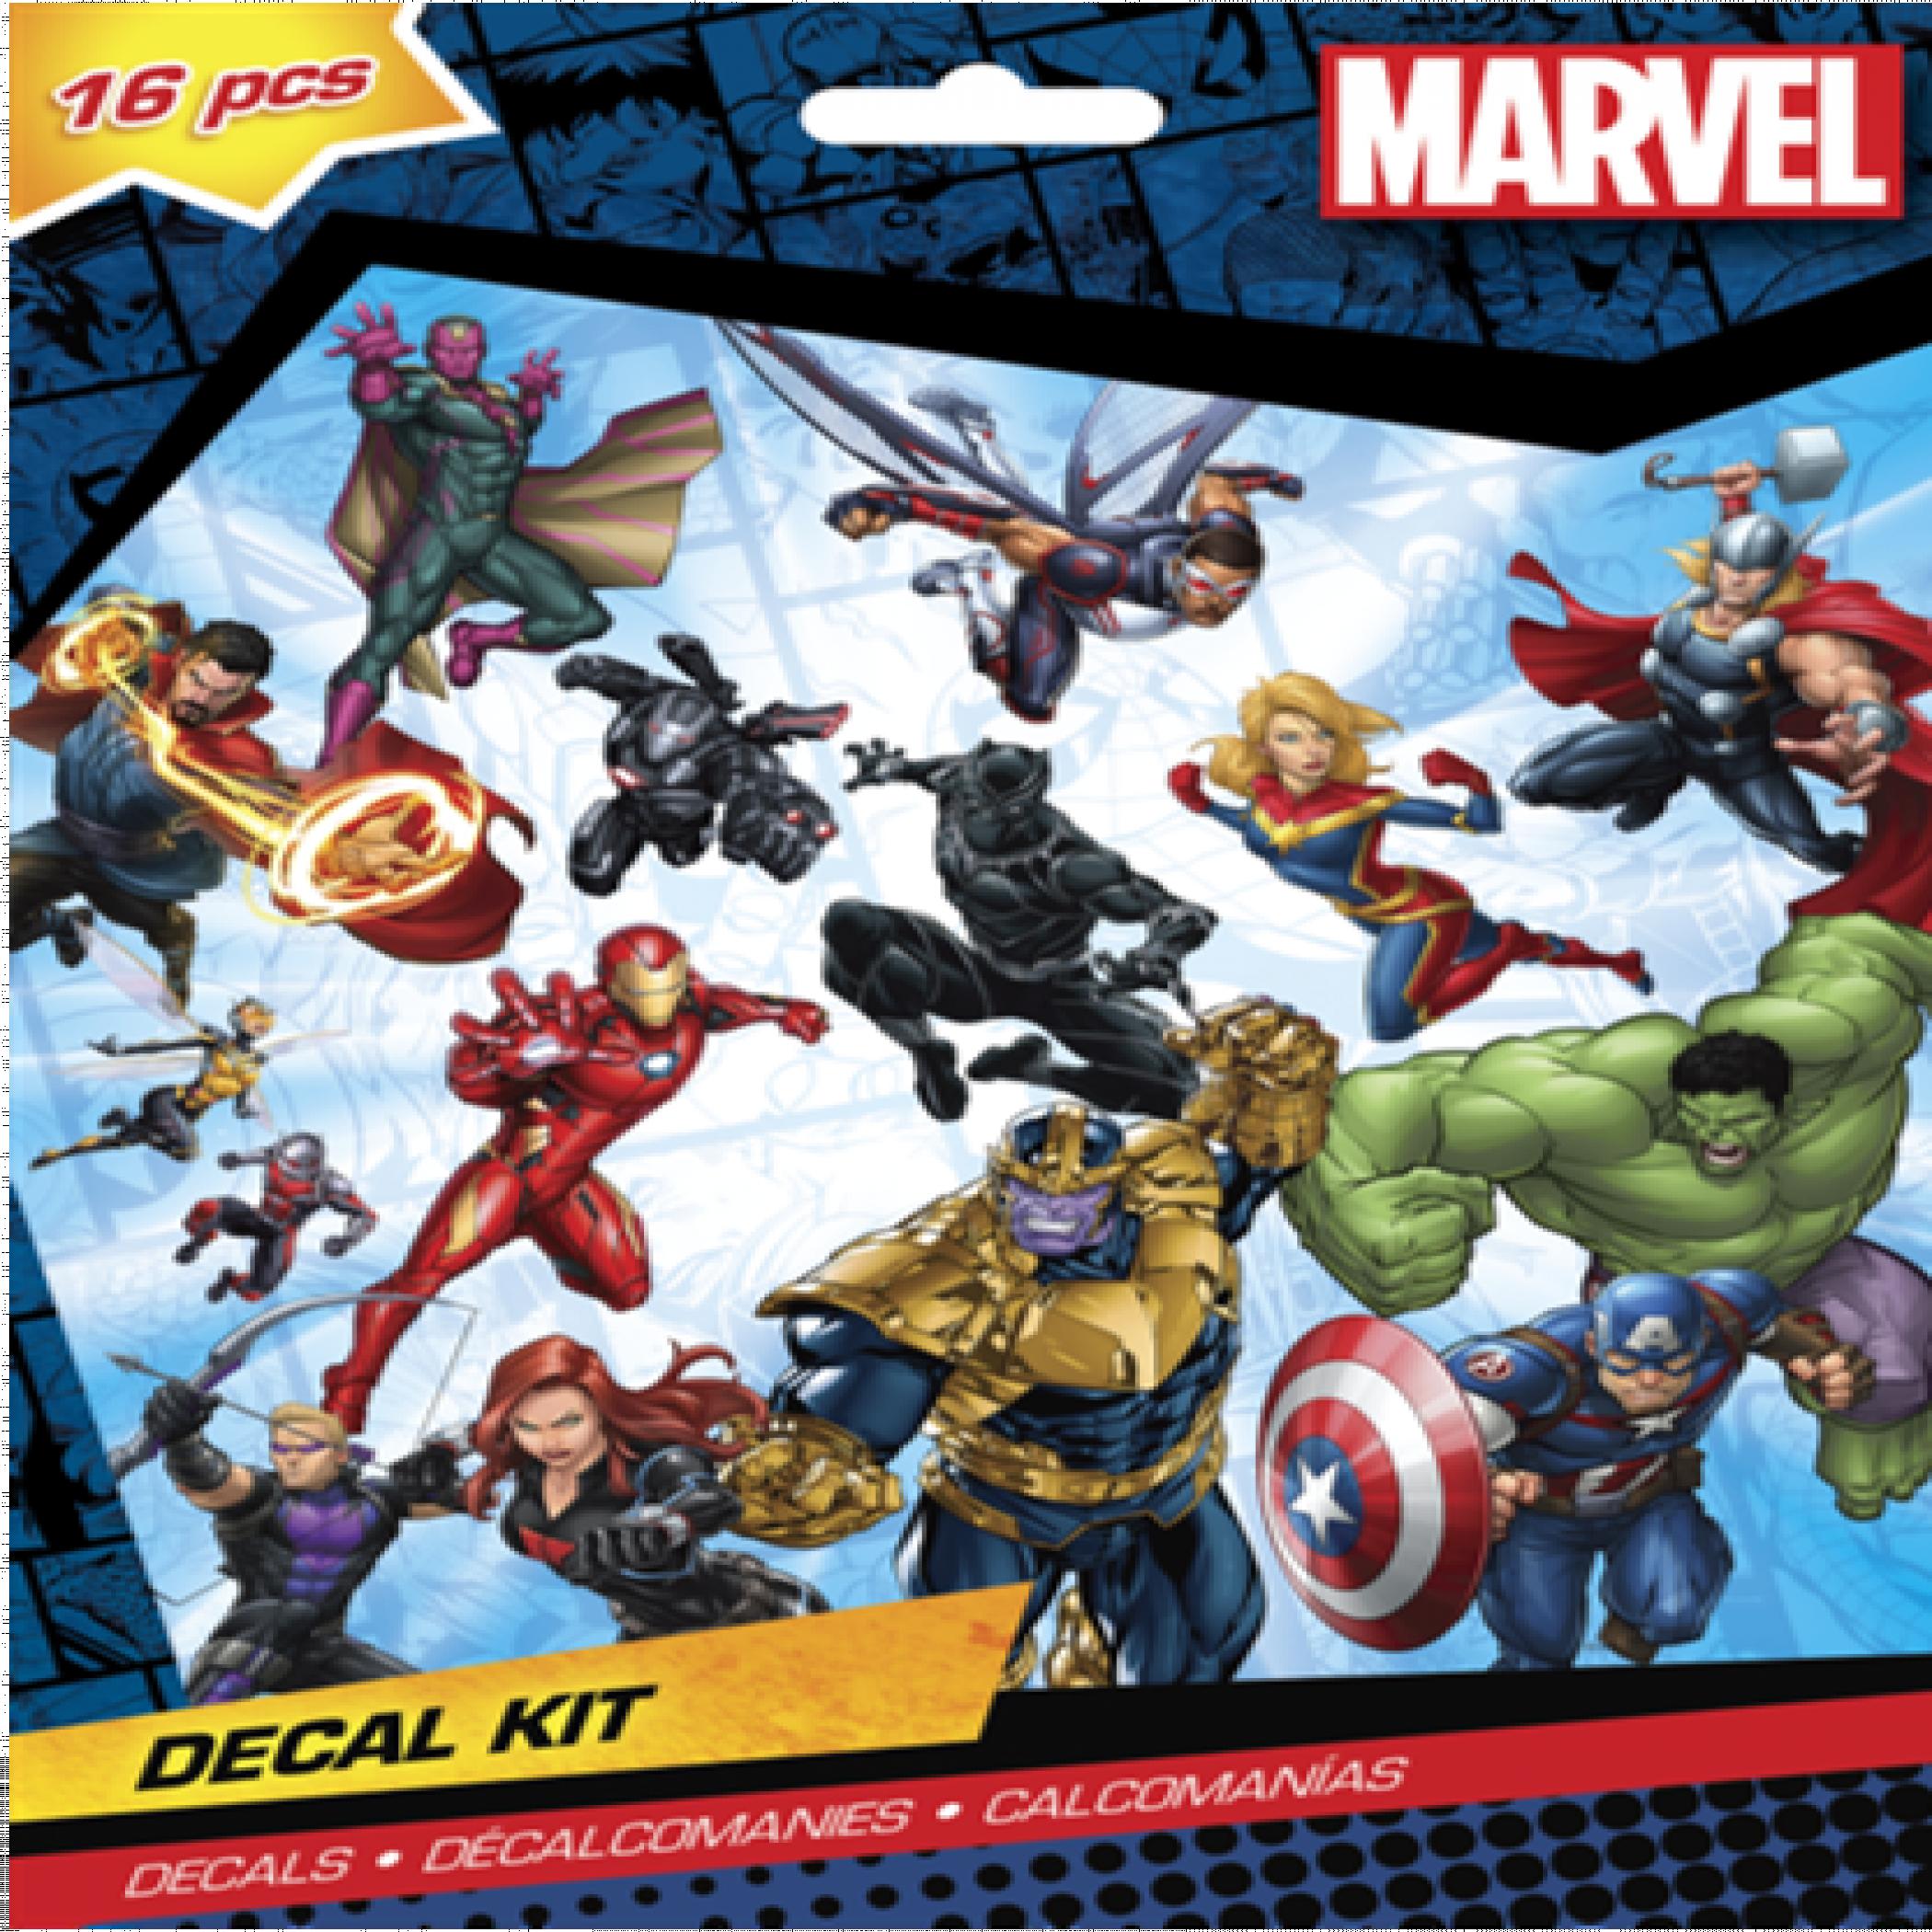 Marvel Avengers 16 Piece Decal Kit